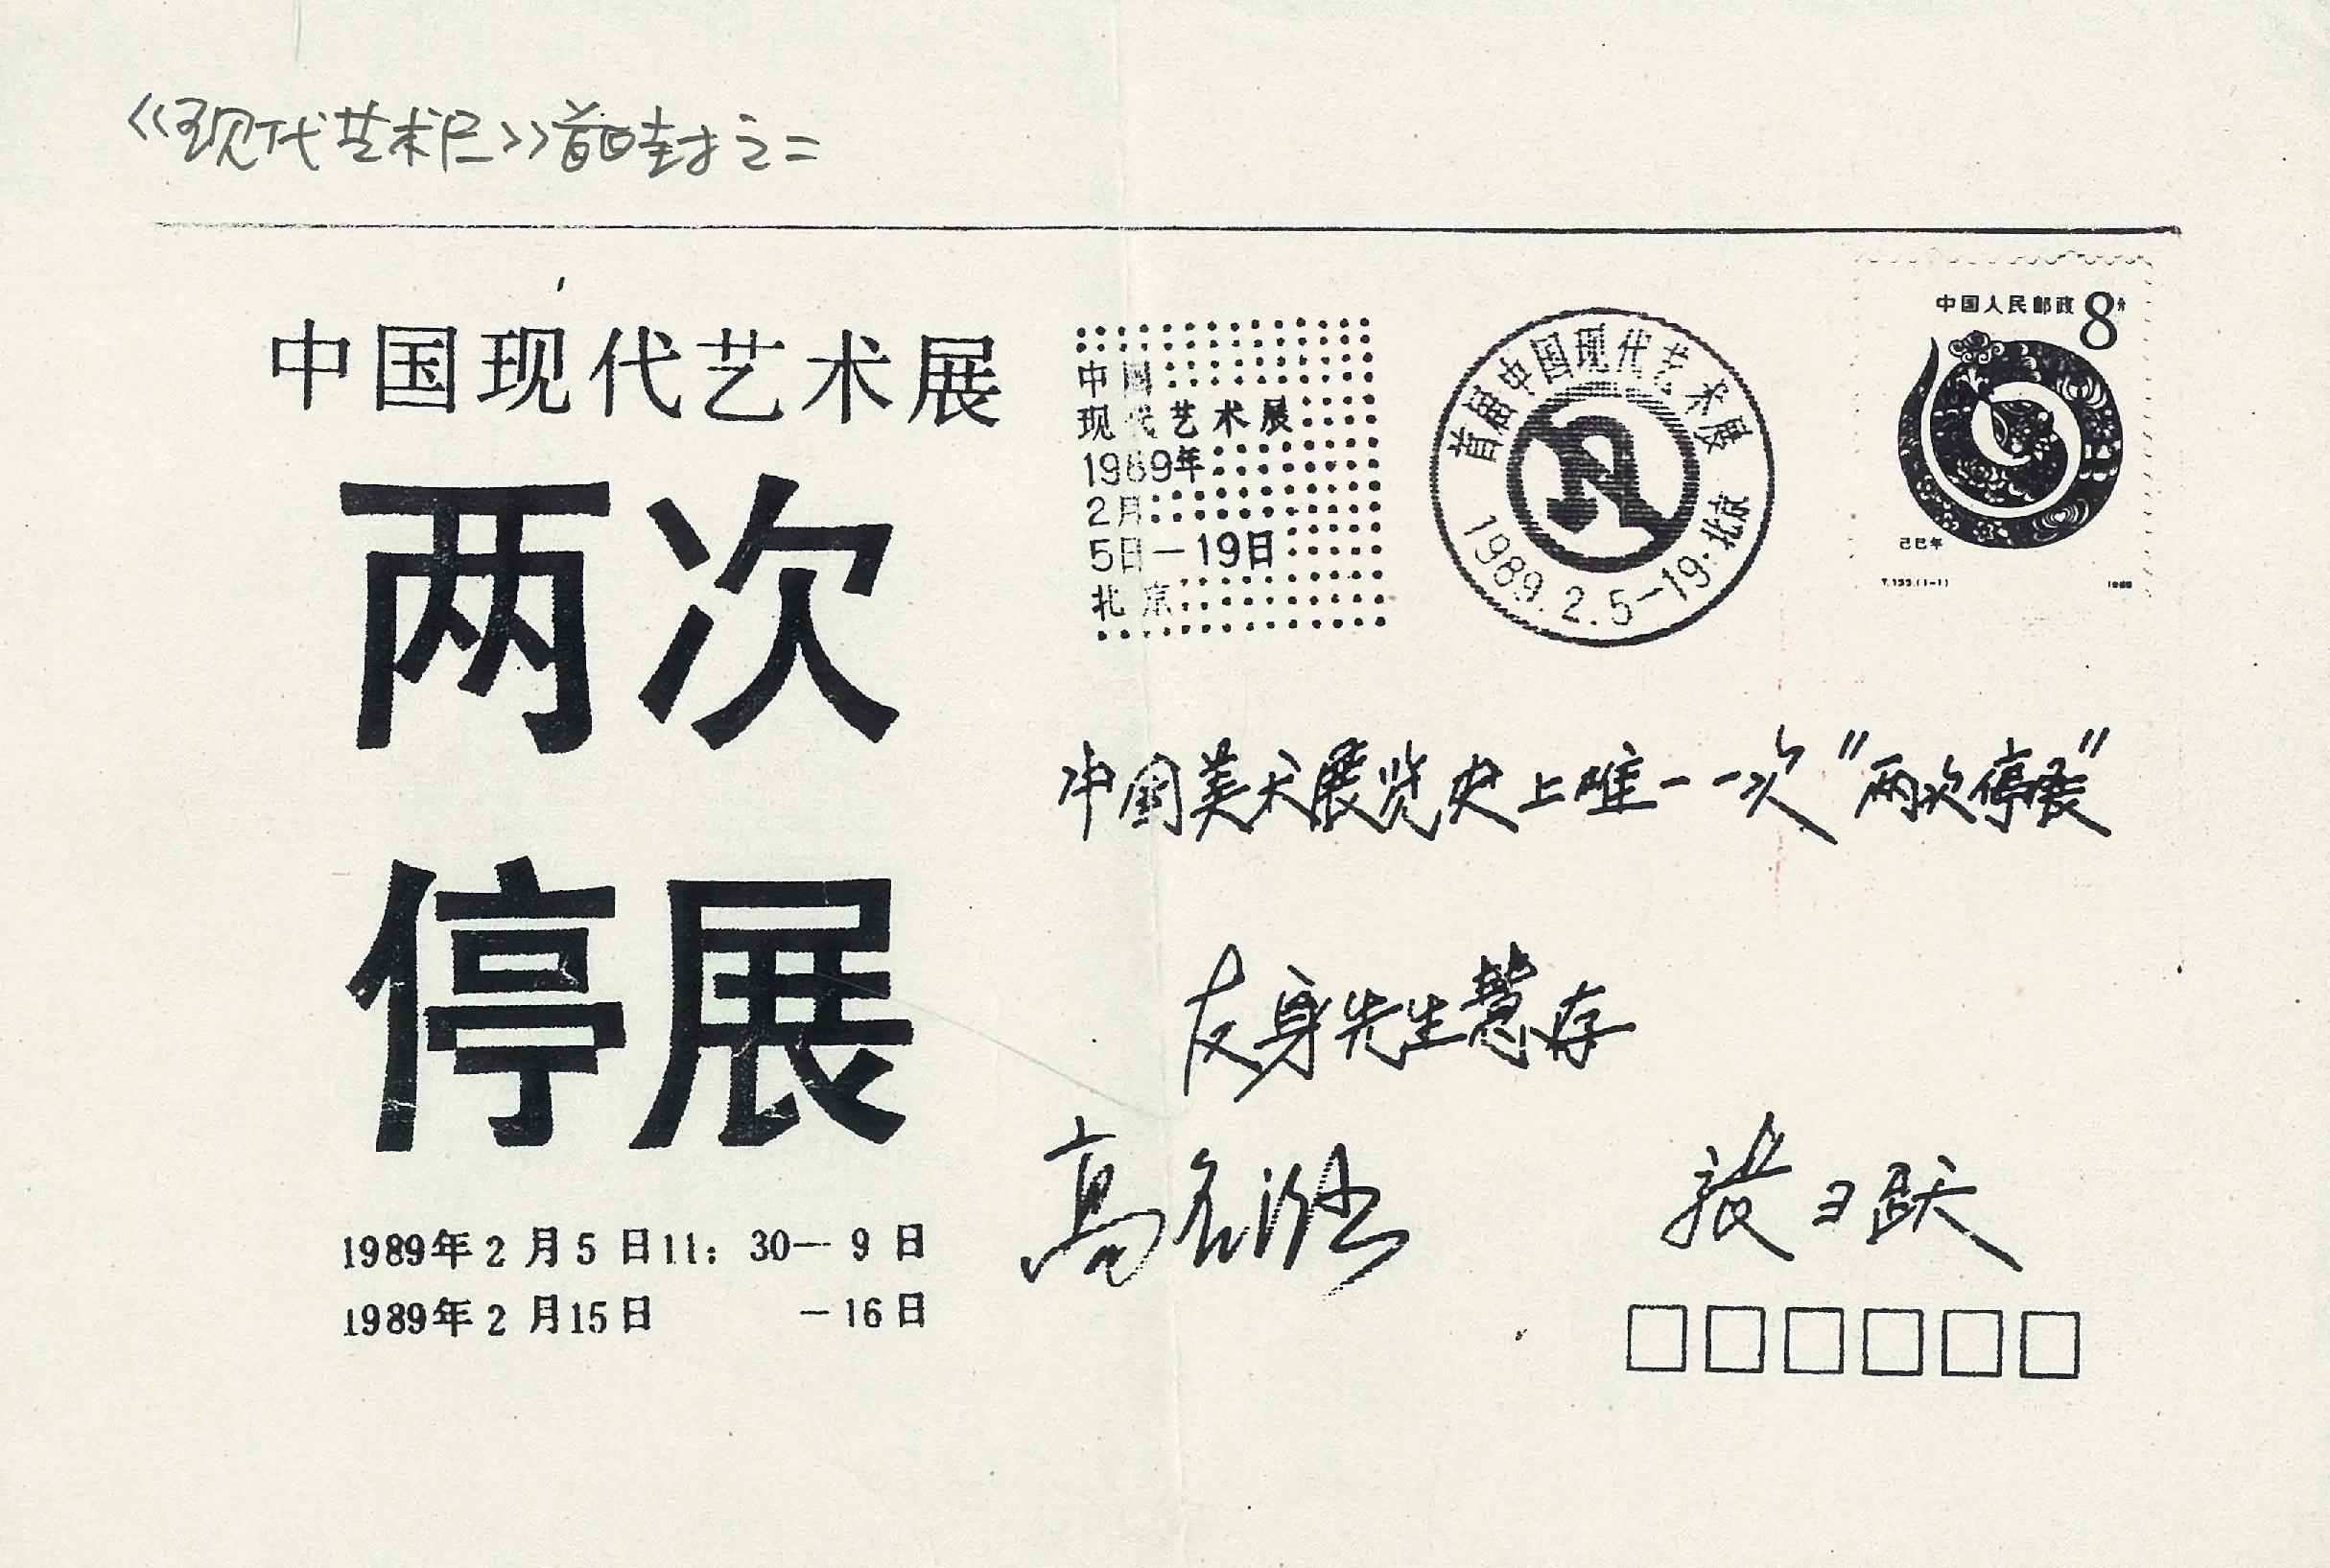 Commemorative Envelope of China/Avant-Garde Exhibition